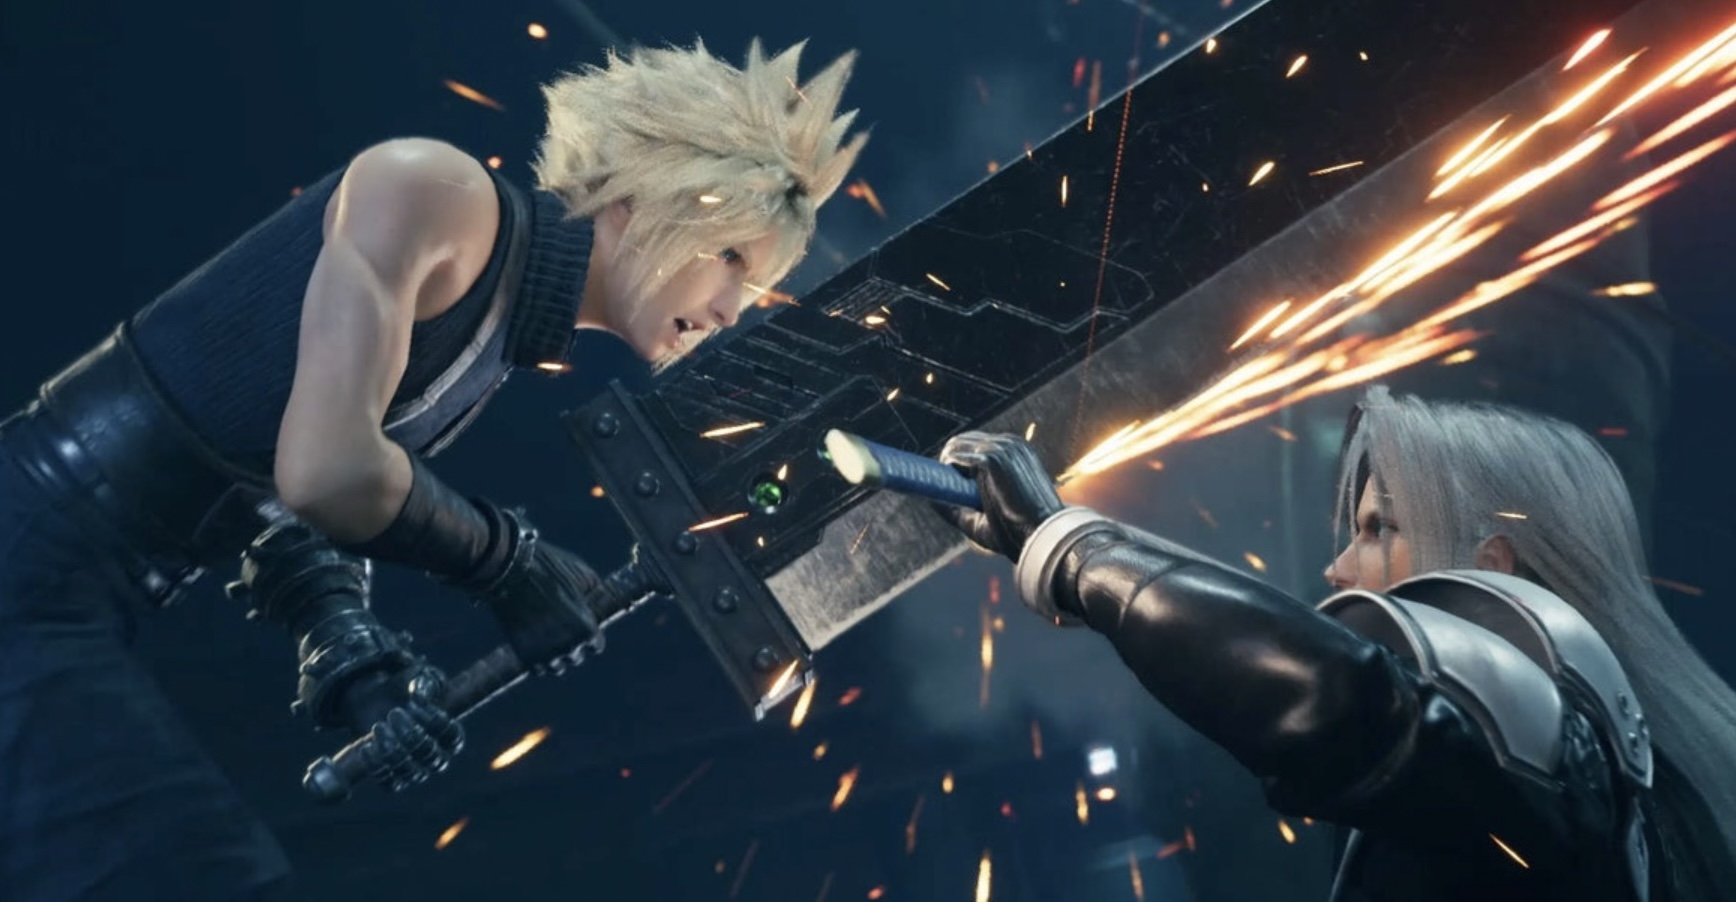 Final Fantasy VII Remake Update 1.02 Patch Notes